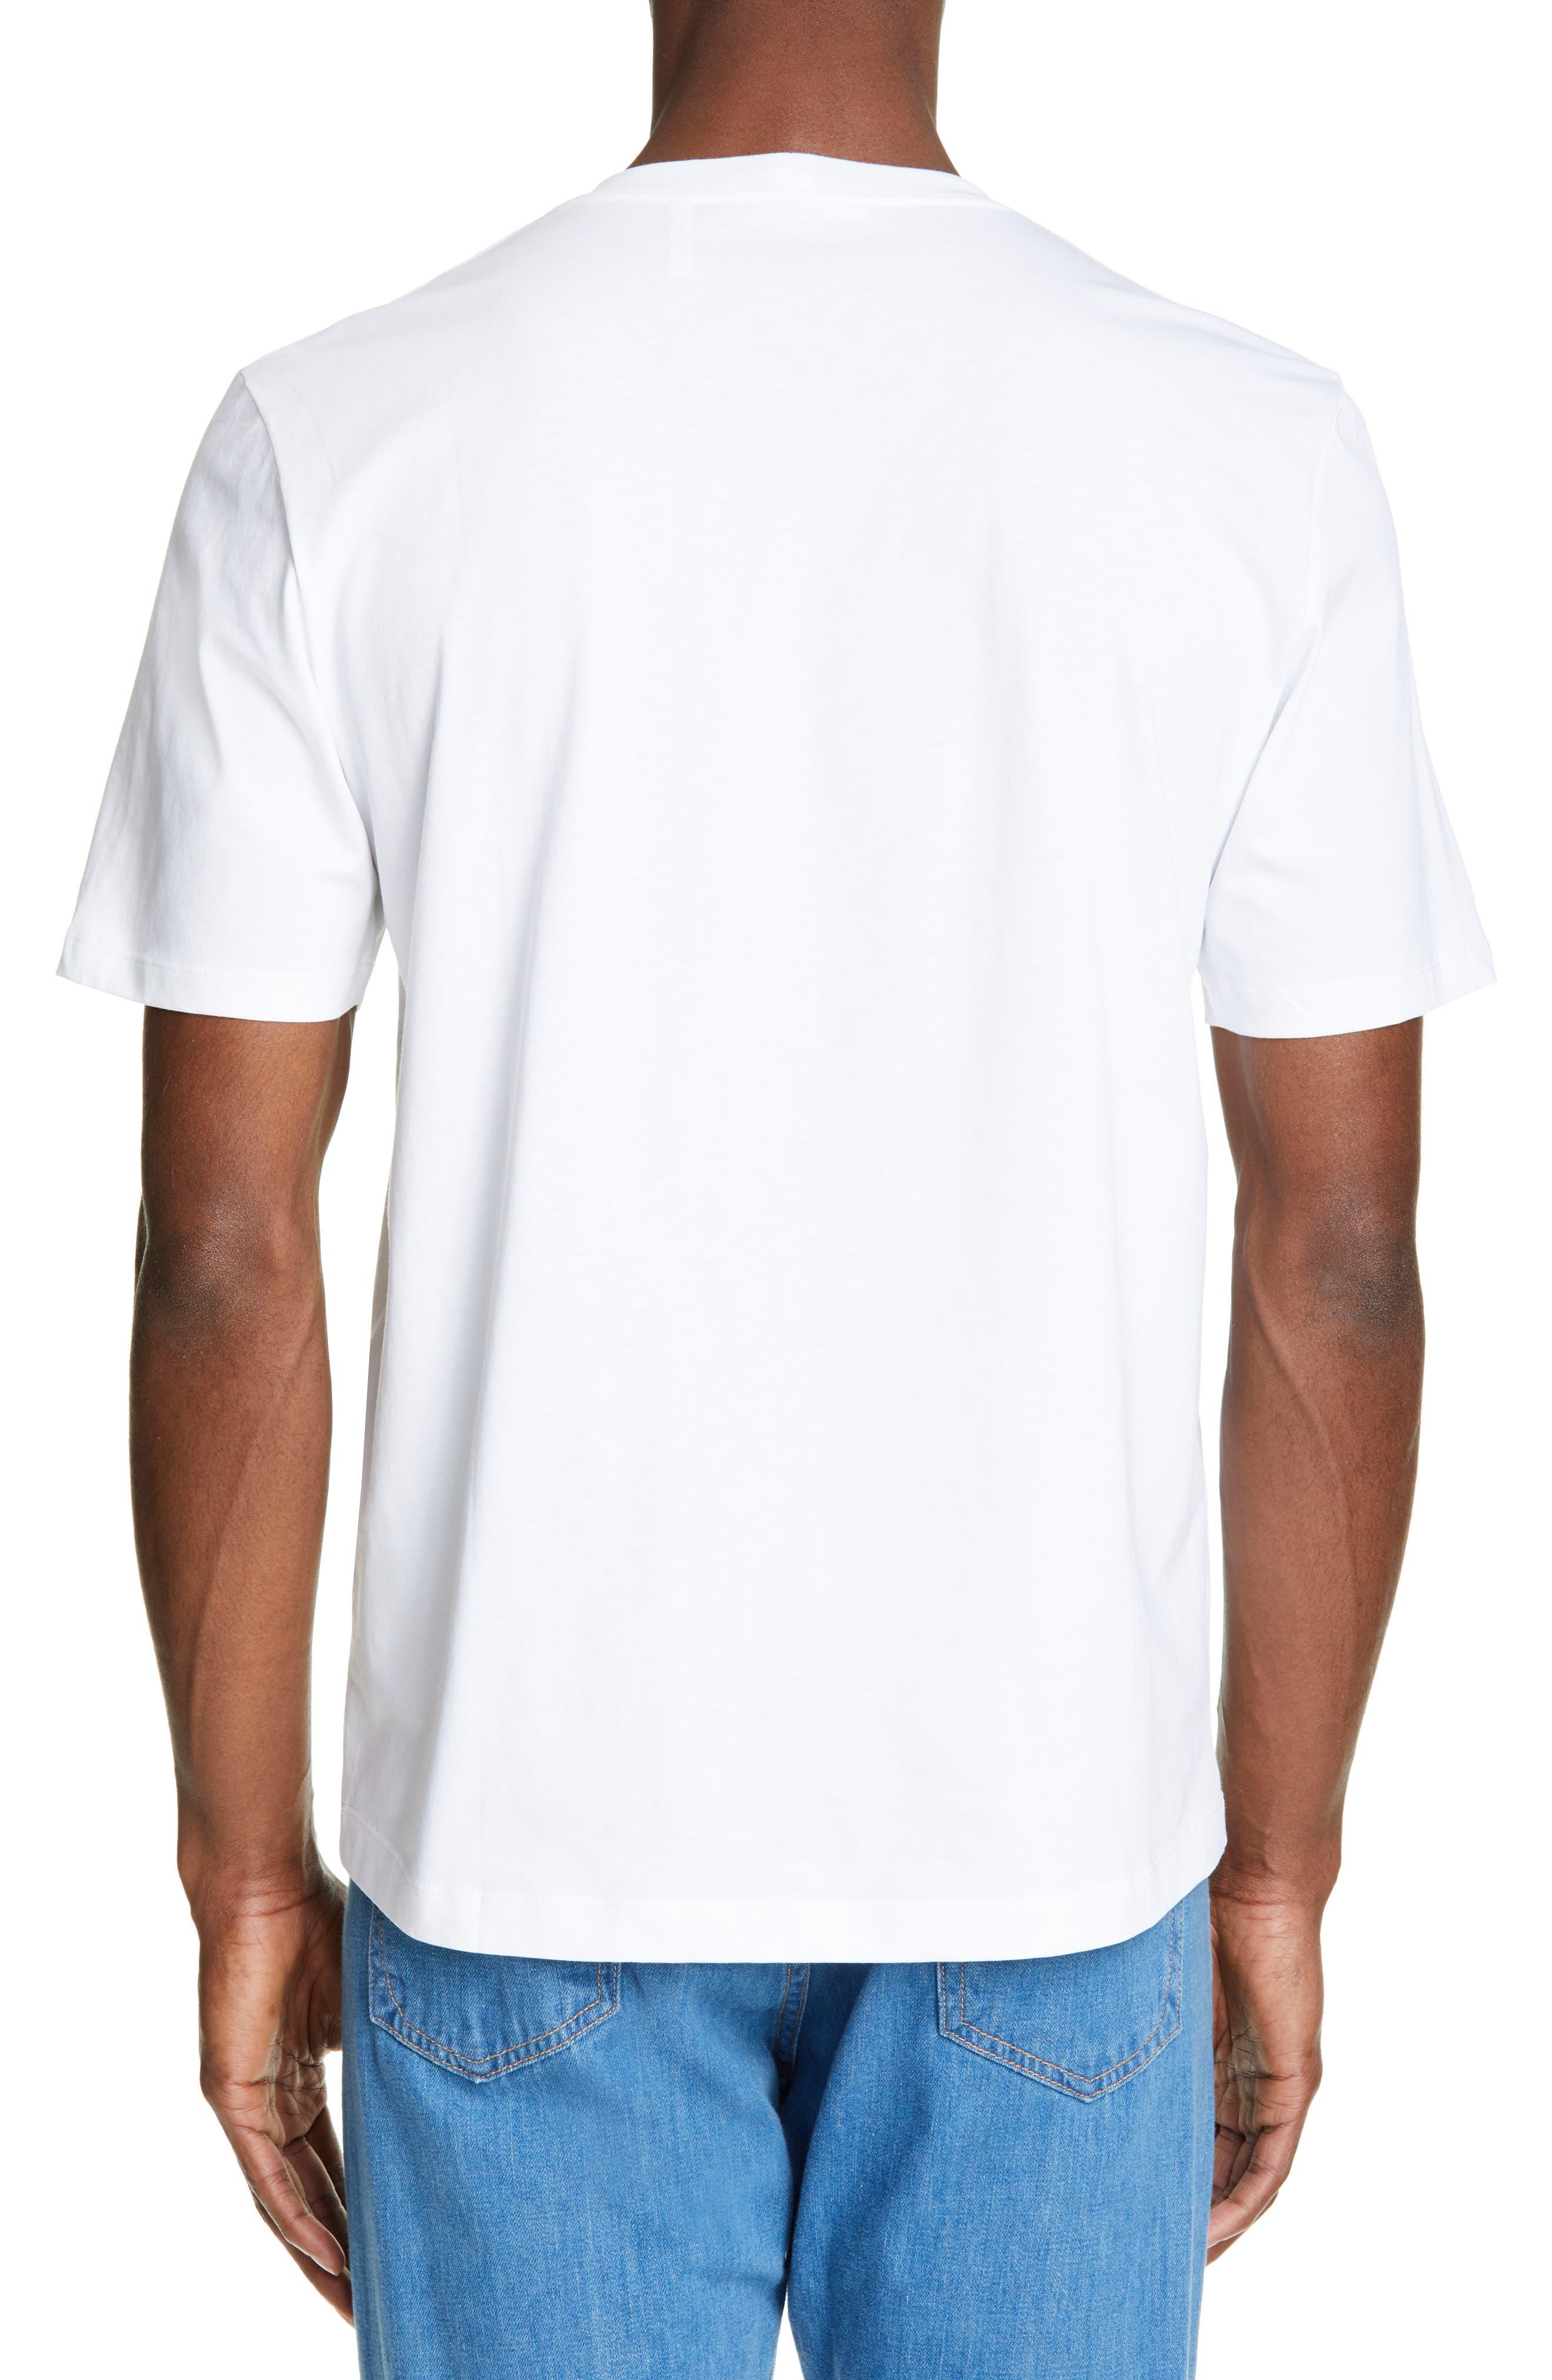 HELMUT LANG, World Turns Graphic T-Shirt, Alternate thumbnail 2, color, CHALK WHITE